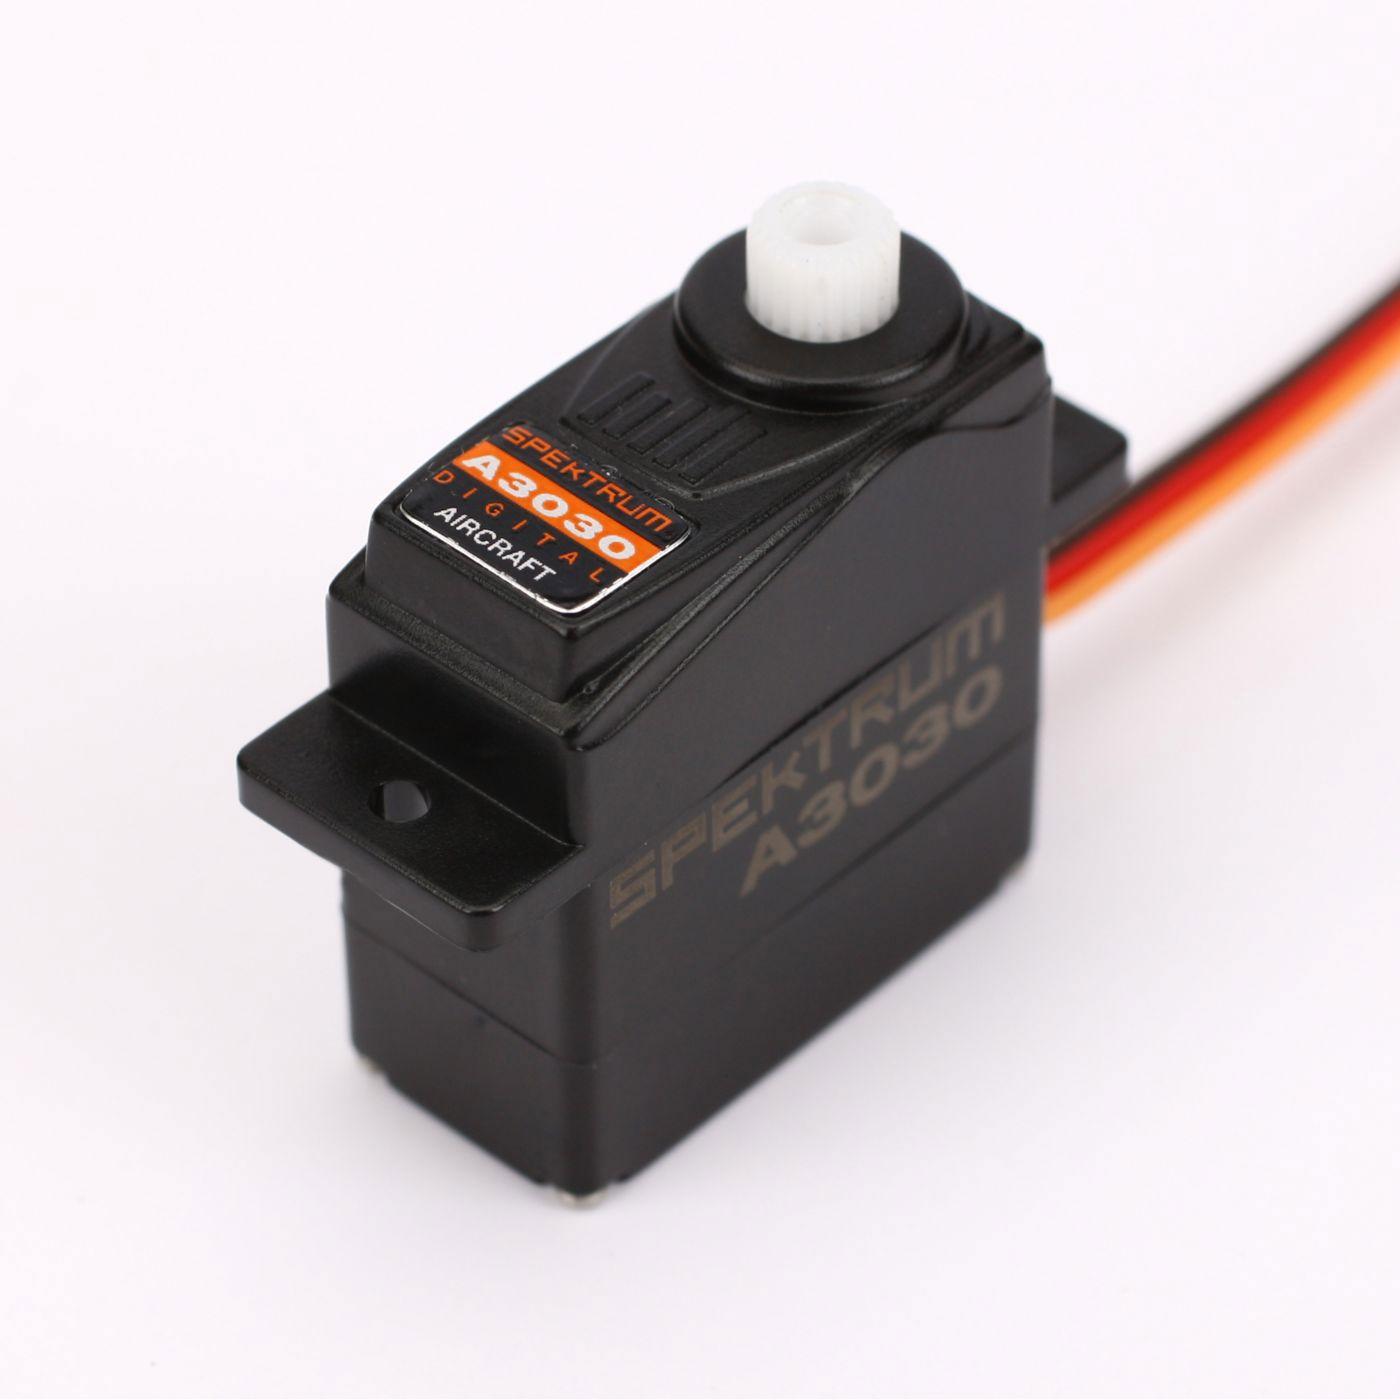 SPM Spektrum S6250 High Torque HV Dig Servo